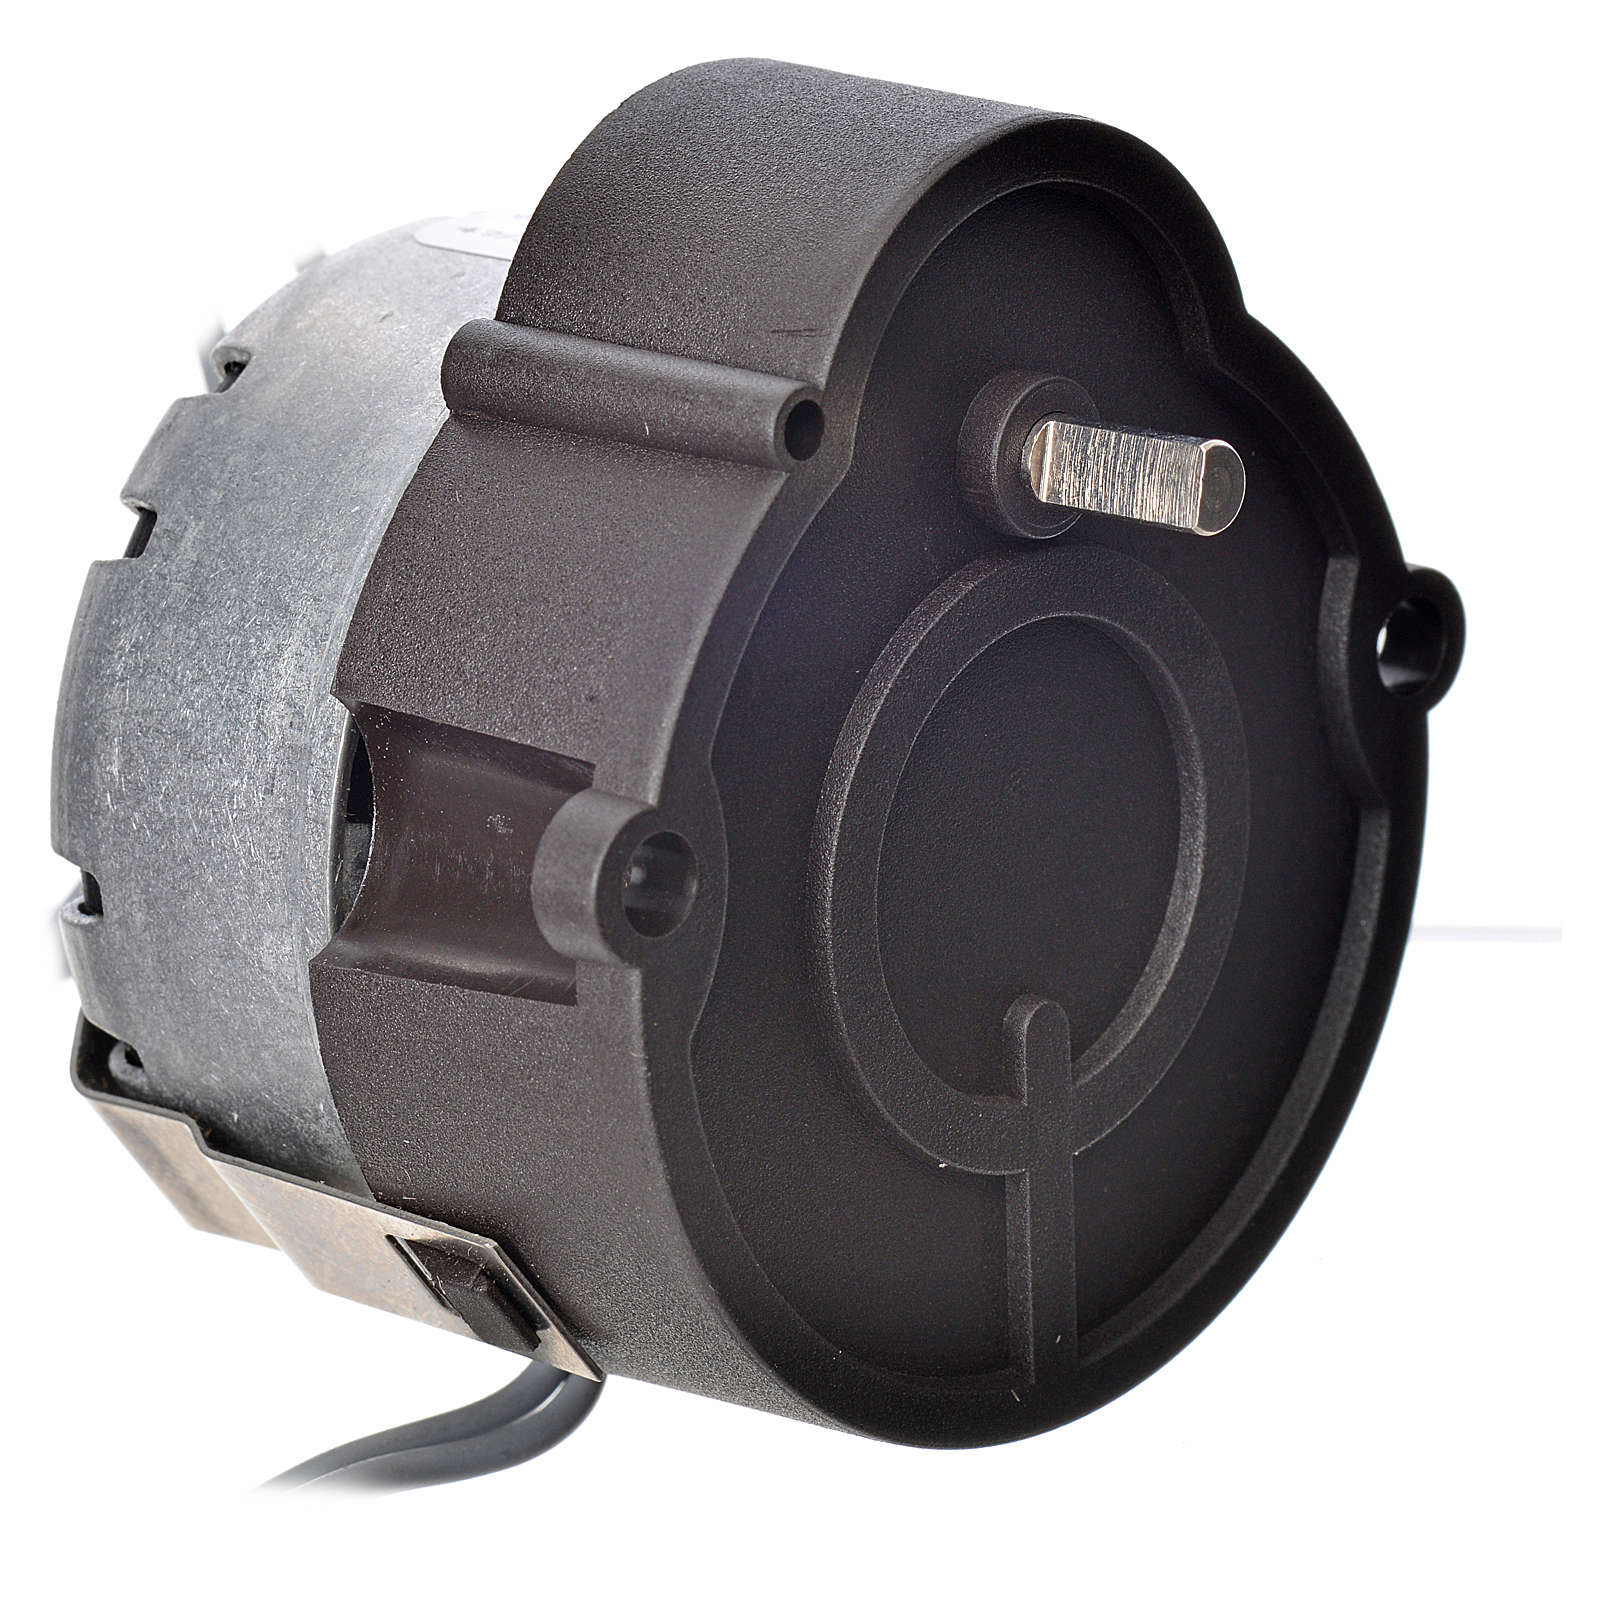 Motoriduttore presepe  MR giri/minuto 30 4